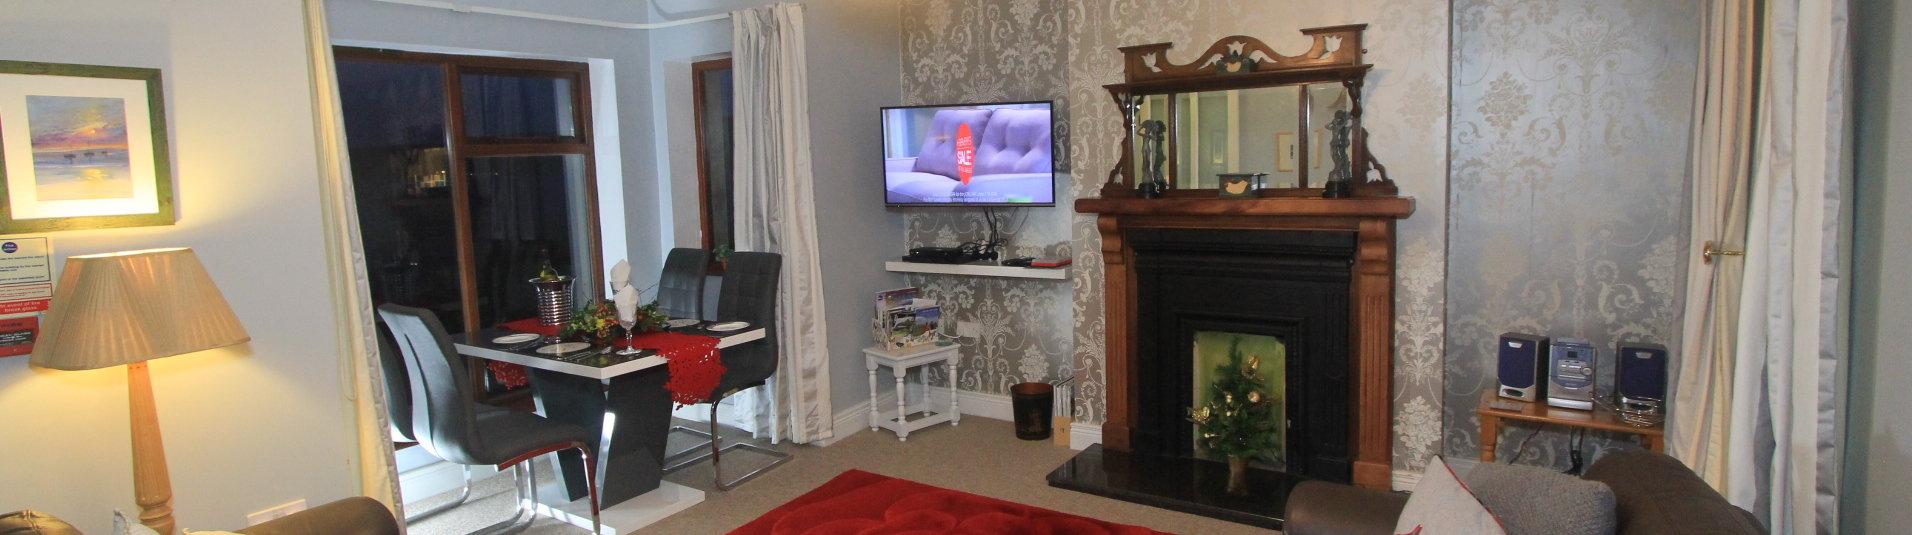 Glencloy Living Room